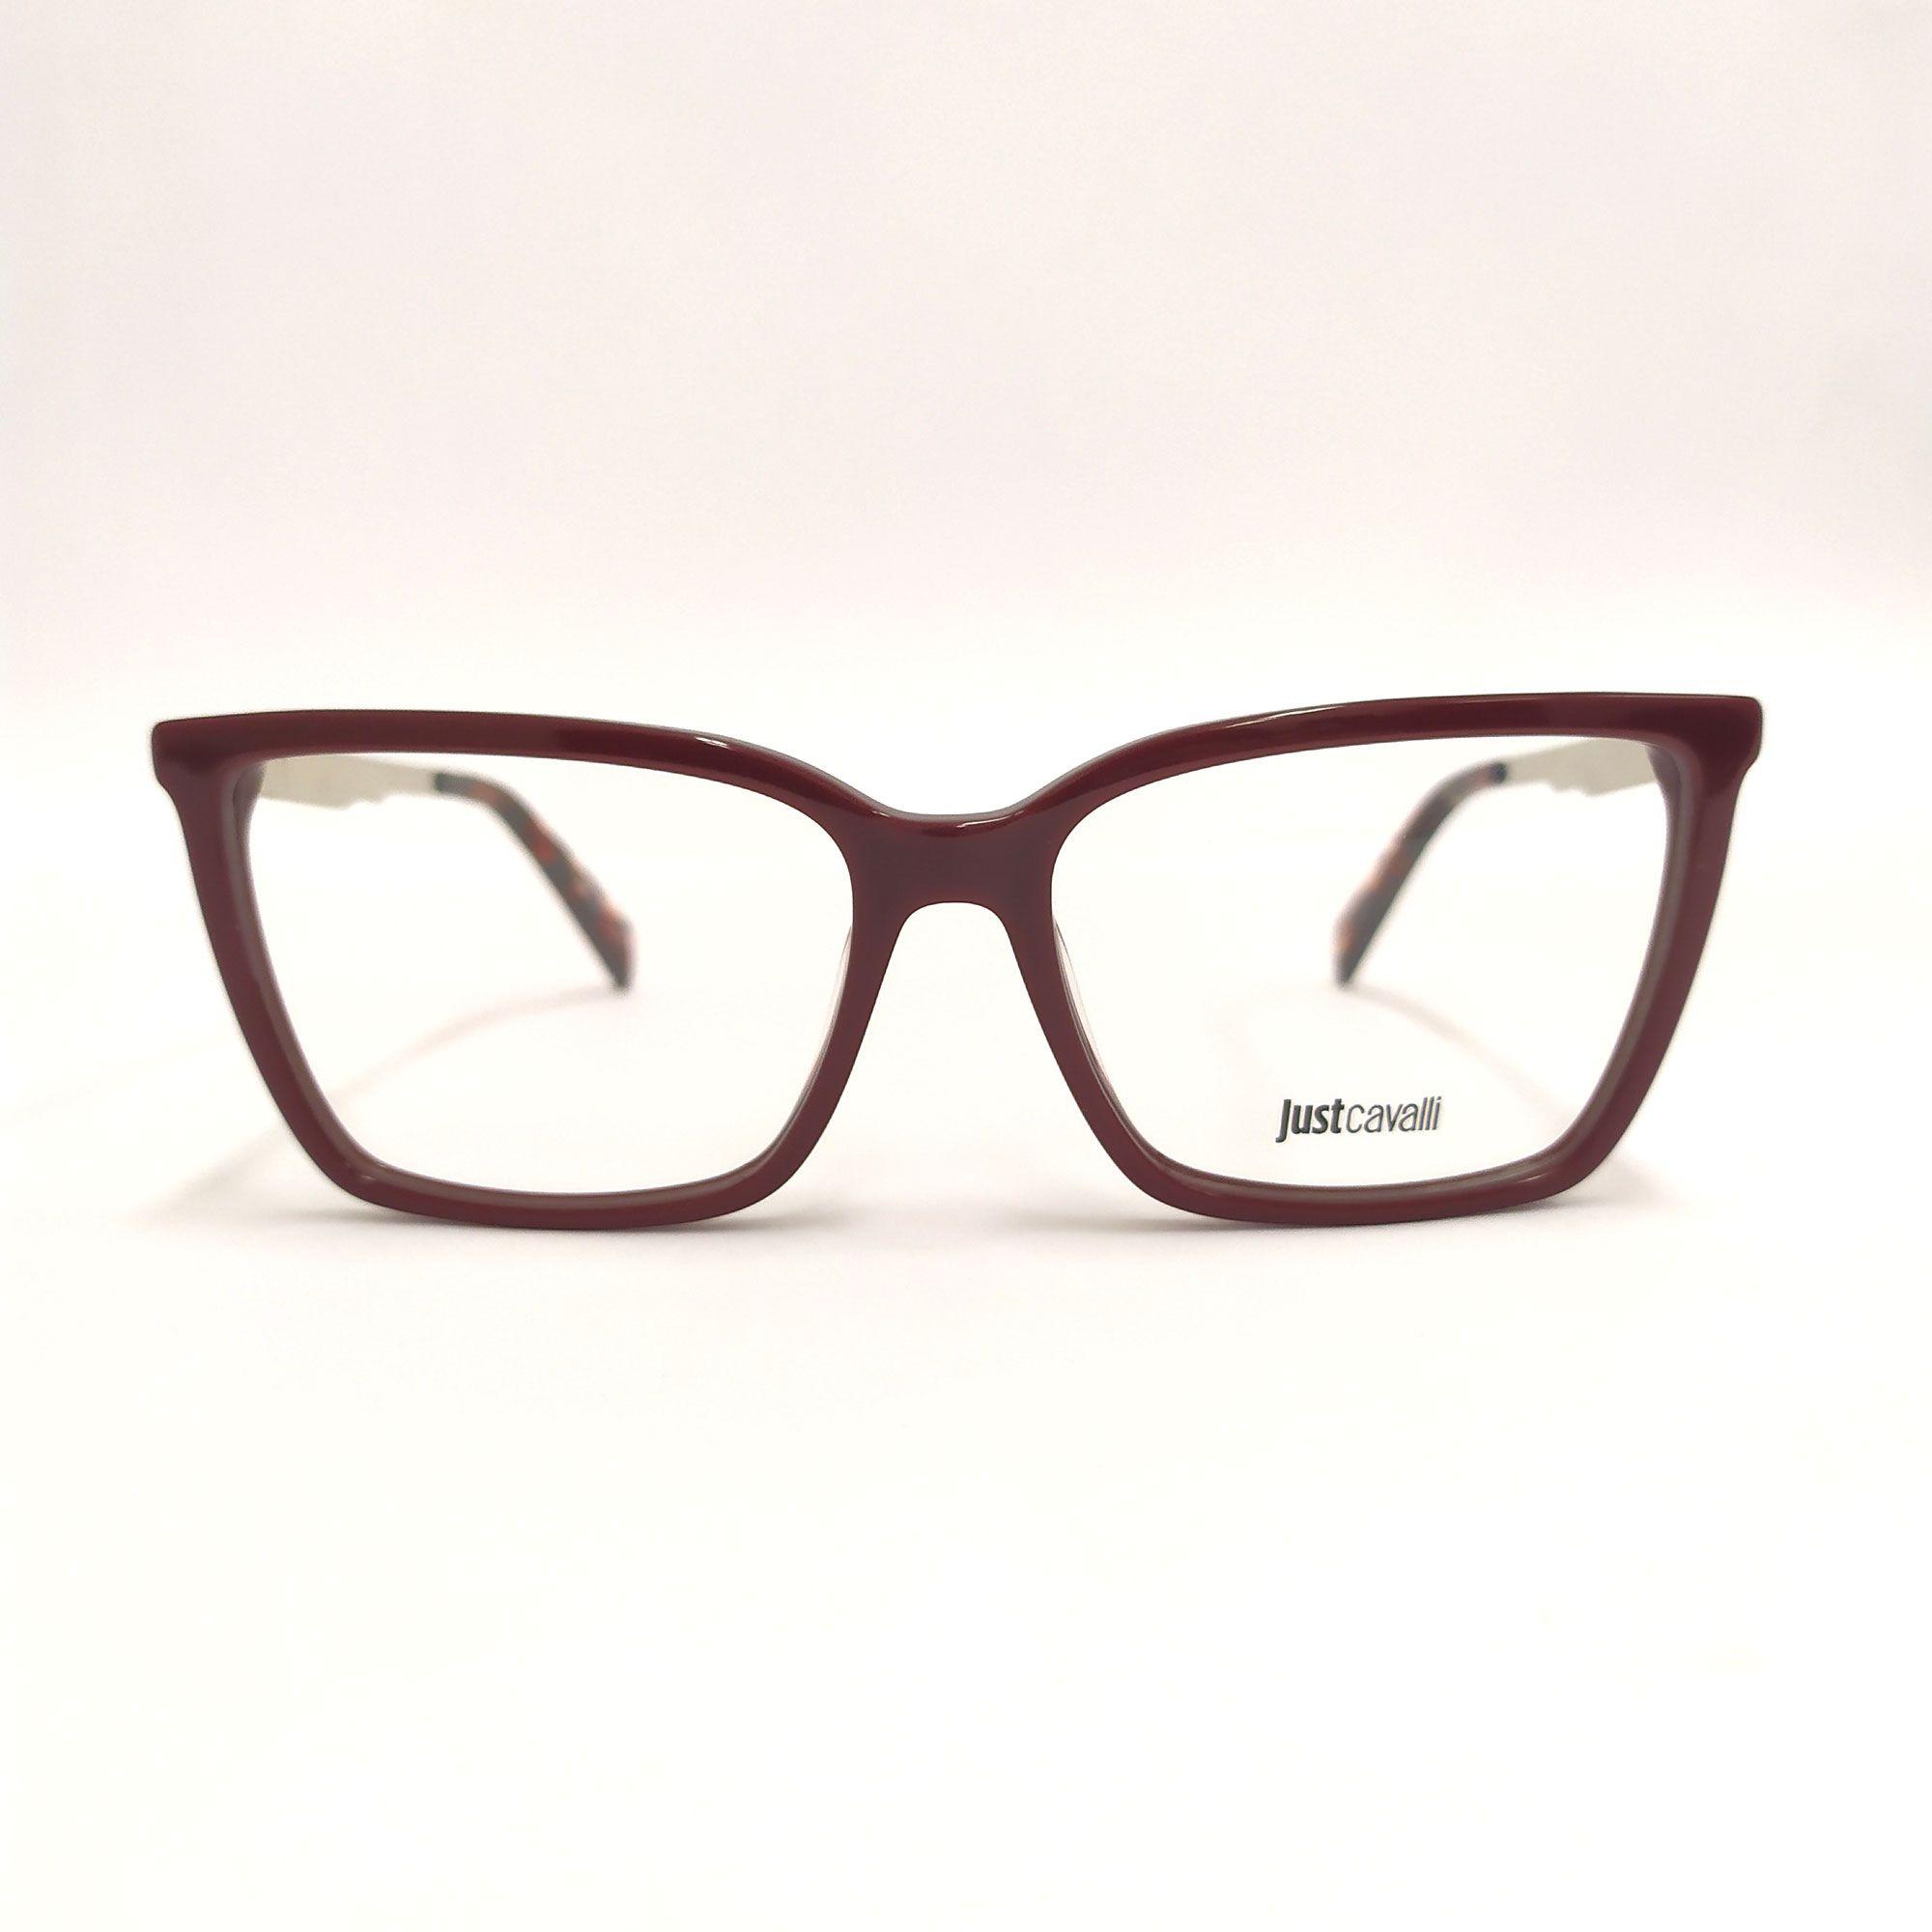 Óculos de Grau Just Cavalli Vermelho JC0813 069